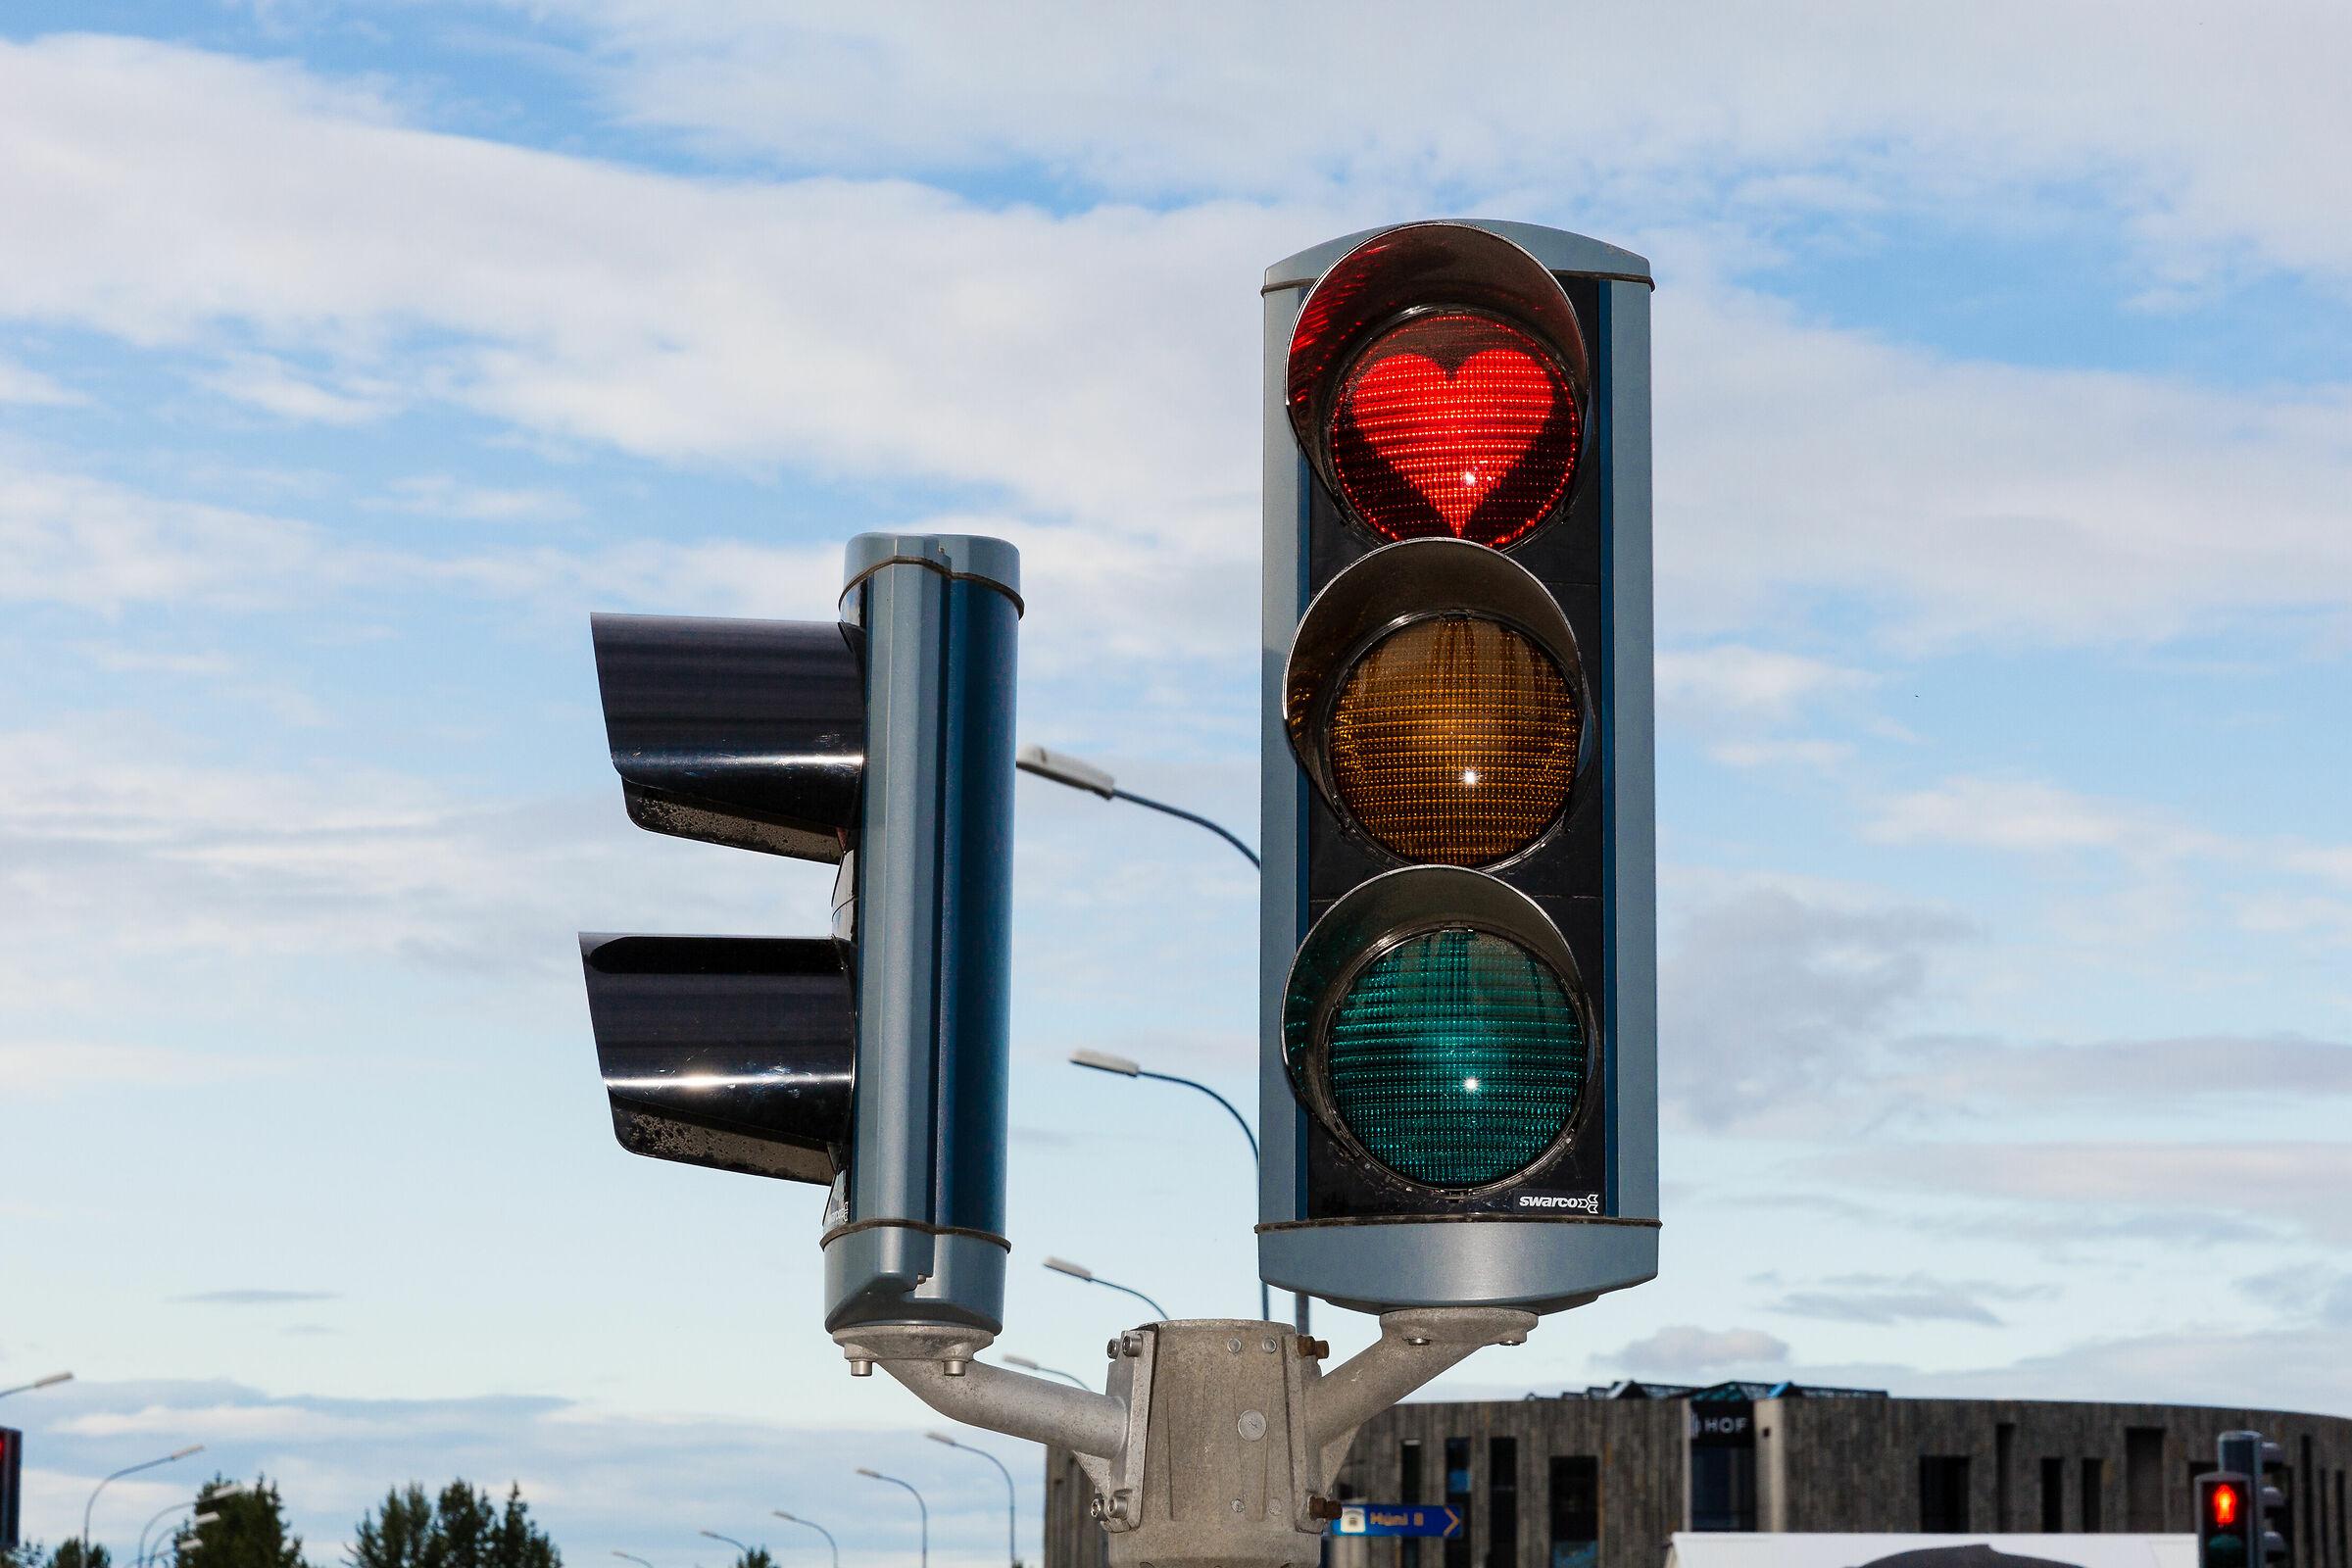 A love of traffic lights...